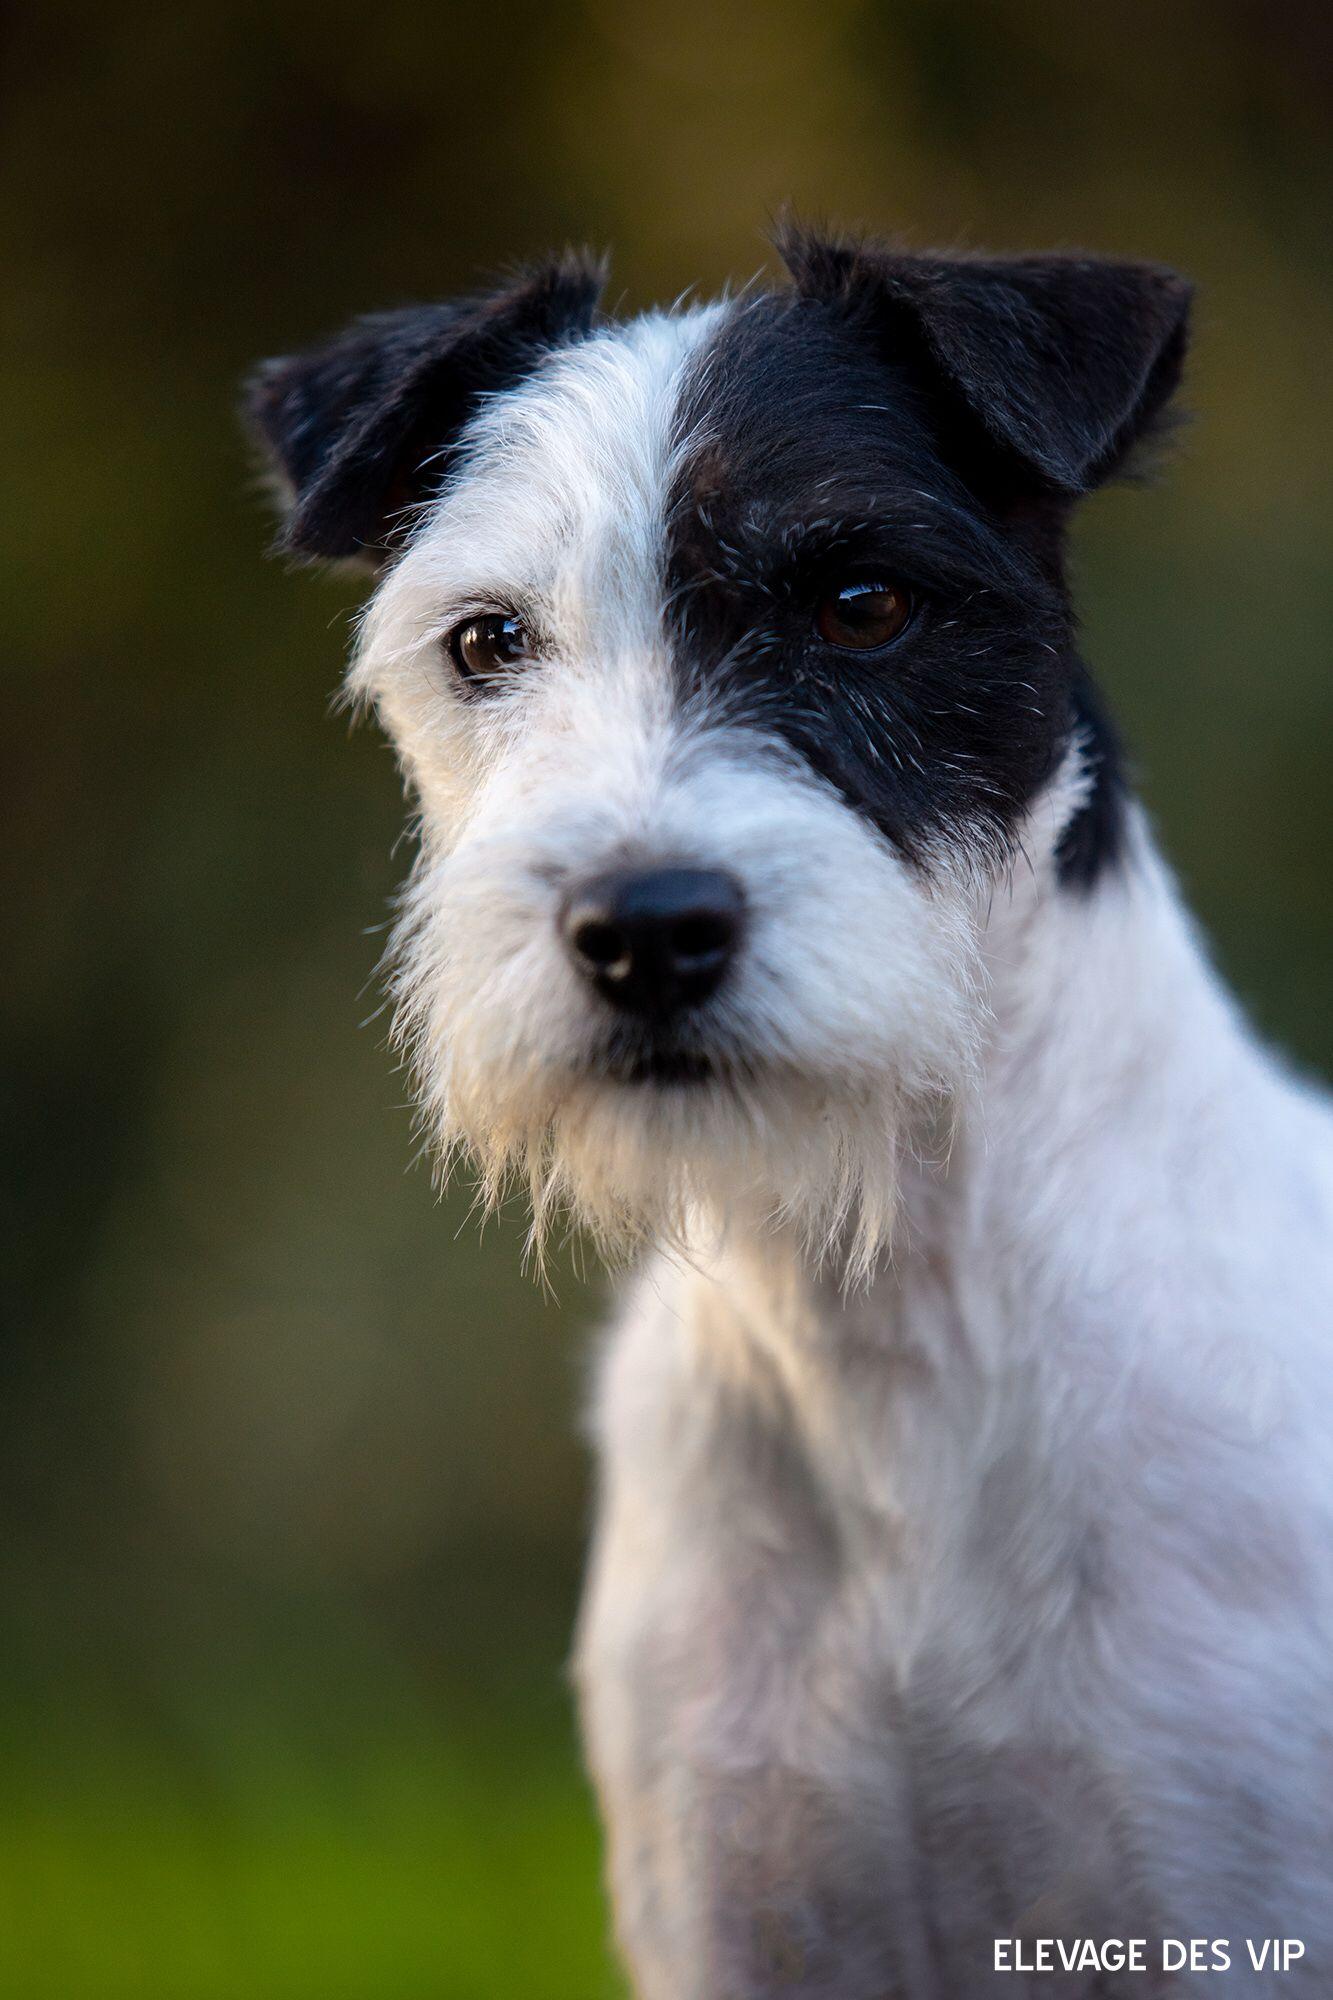 Linette Des Very Important Parson Jack Russell Terrier Chien Jack Russel Parson Russell Terrier